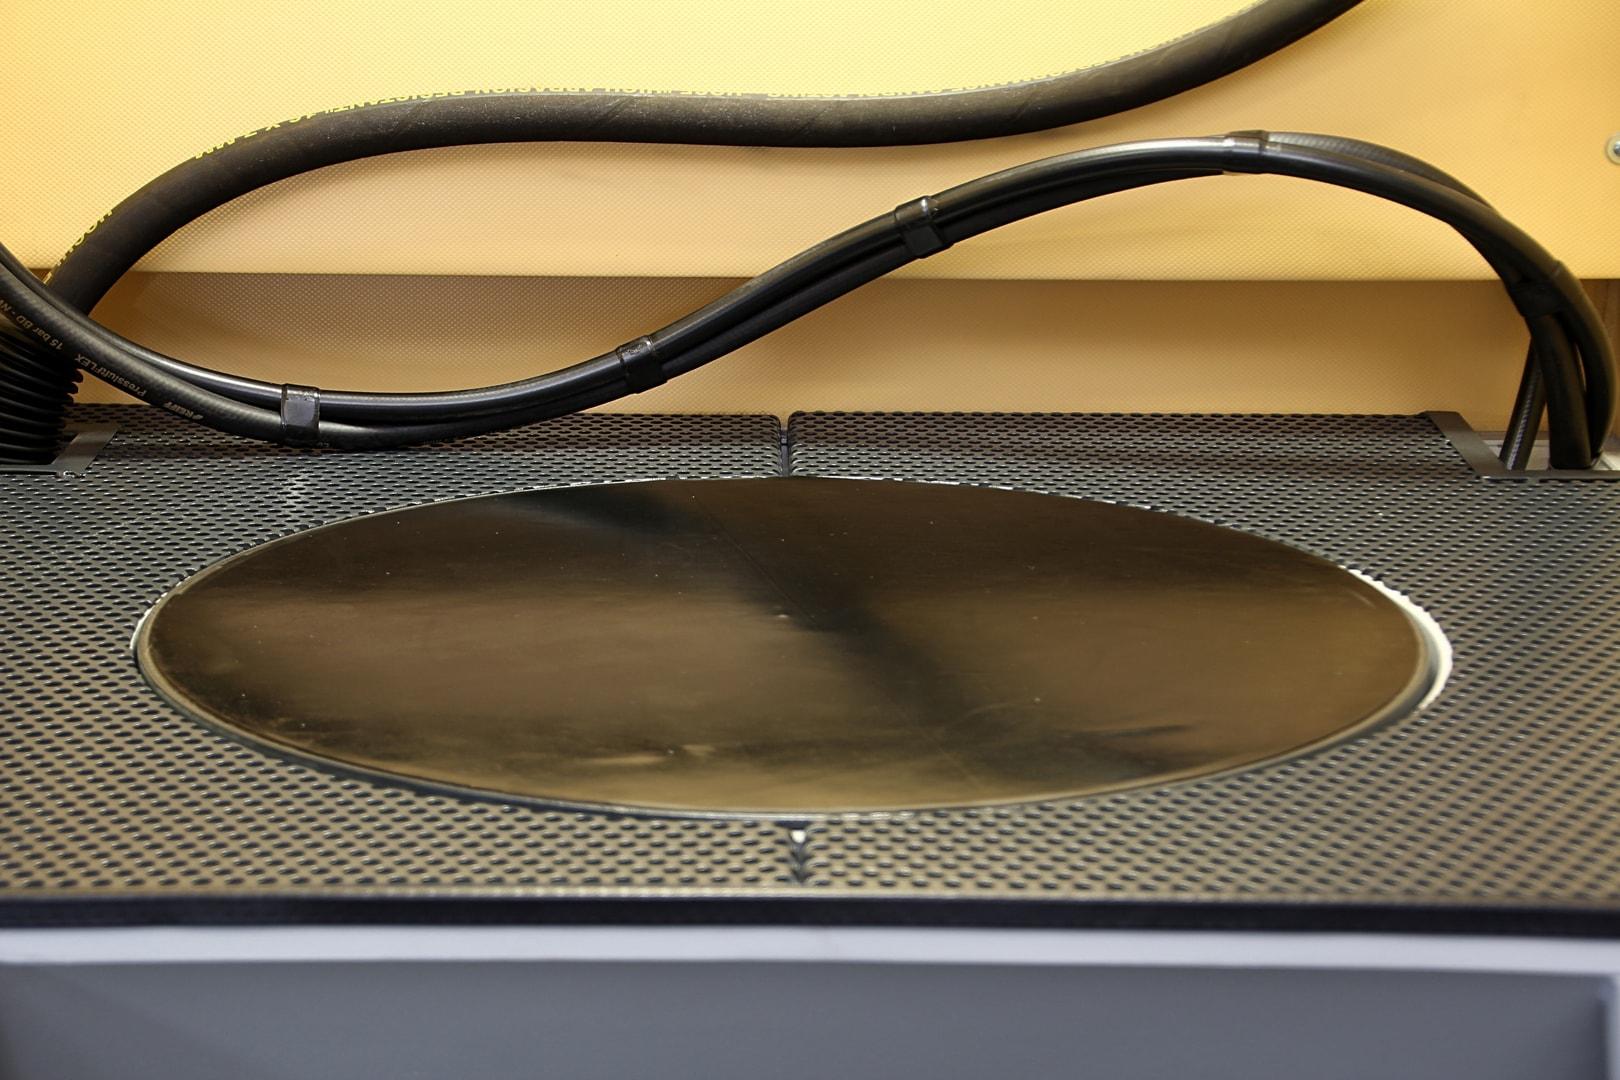 Drehteller 600 mm im Arbeitsrost versenkt